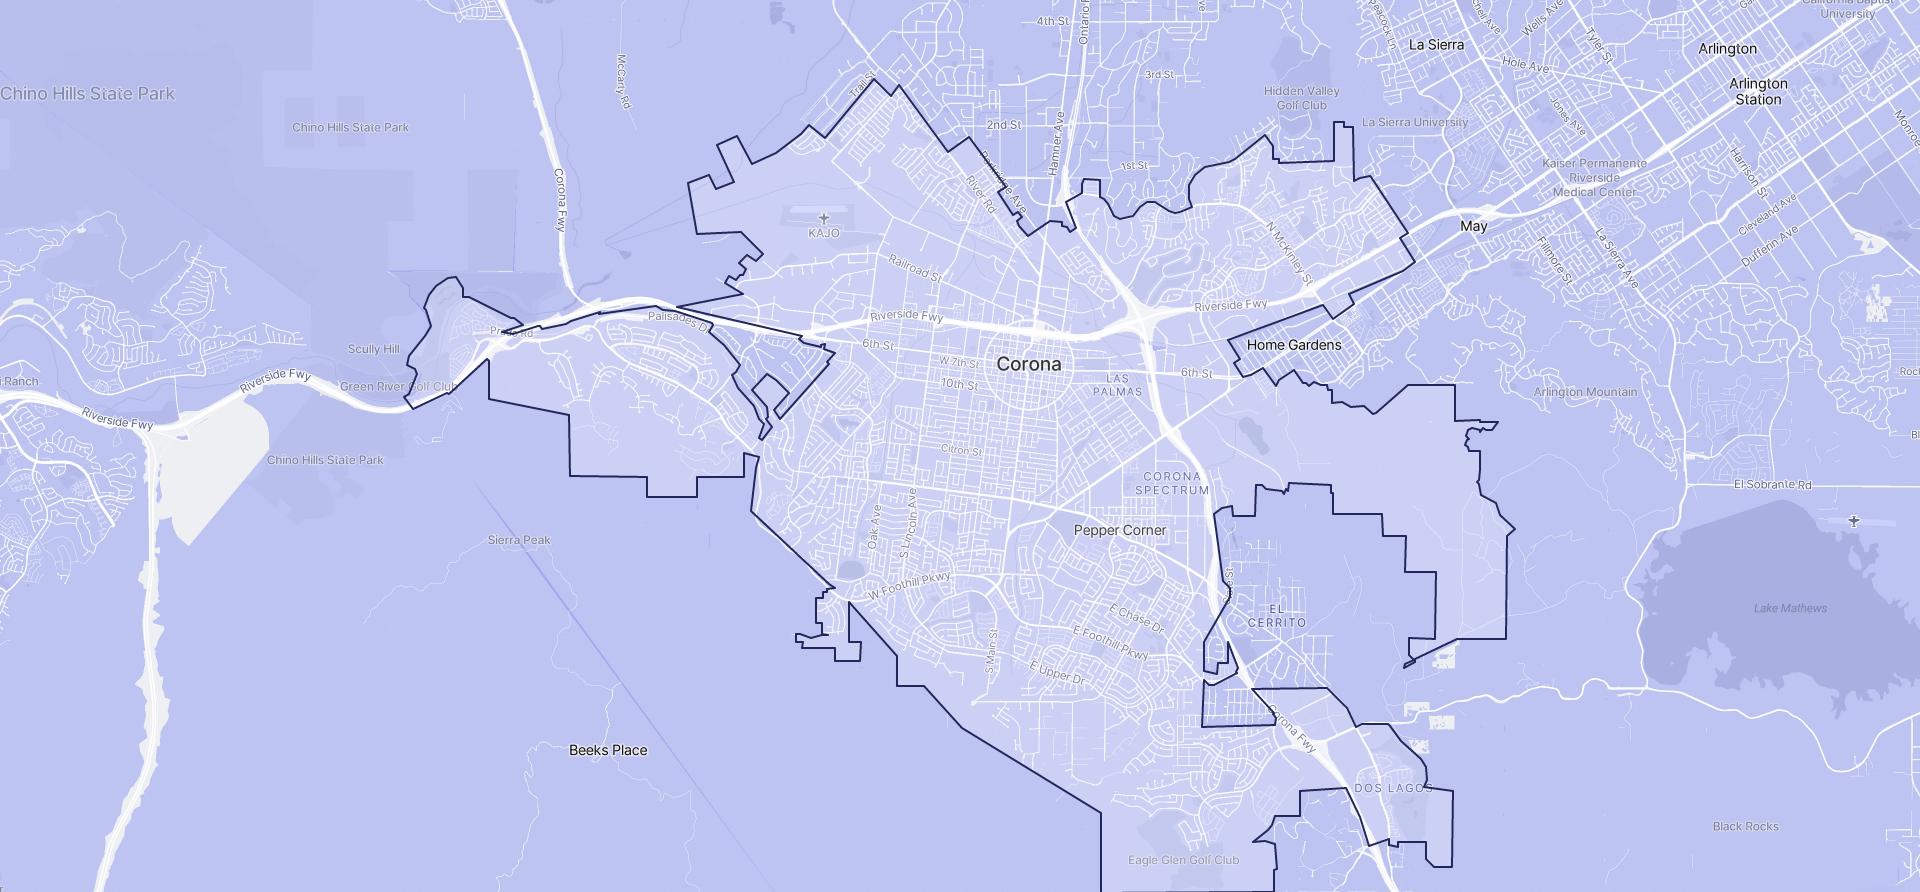 Image of Corona boundaries on a map.